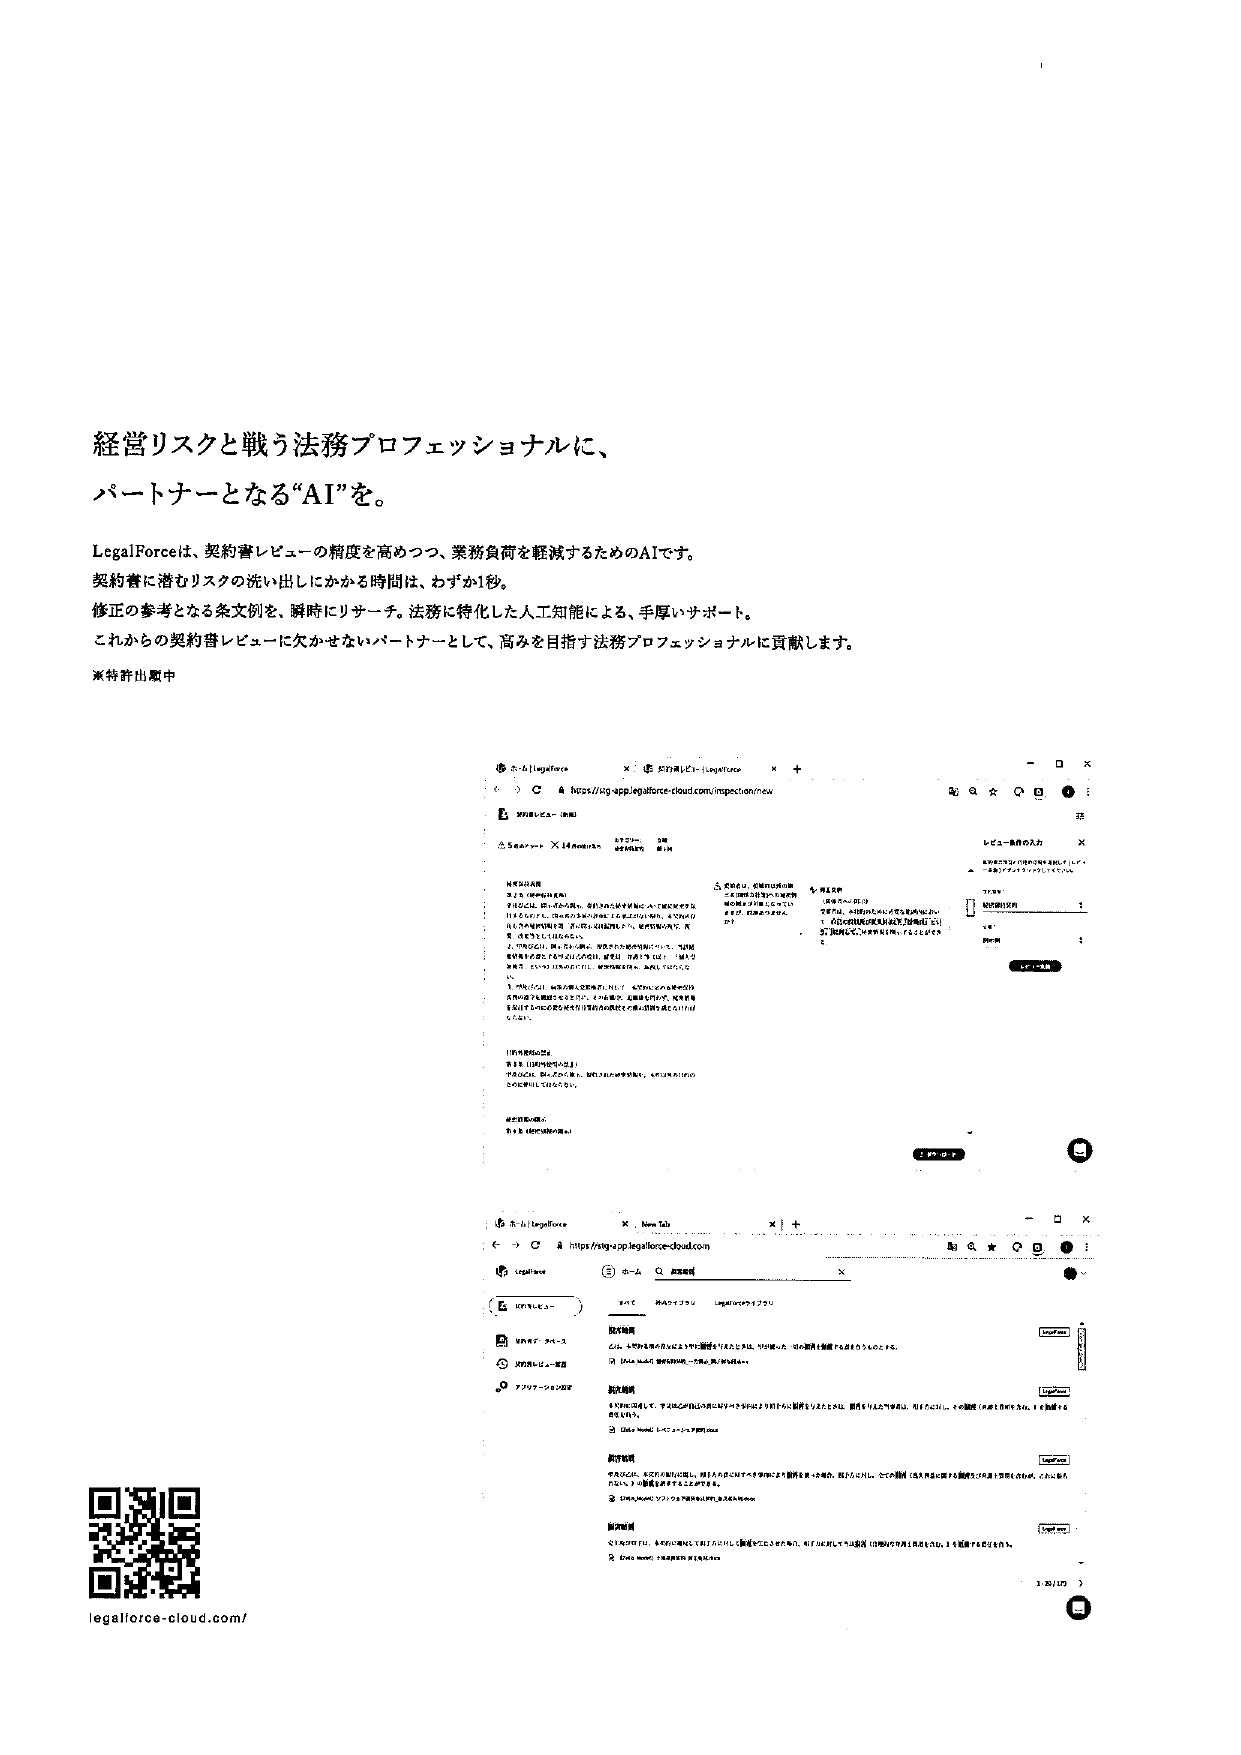 20190404155650_page-0011.jpg